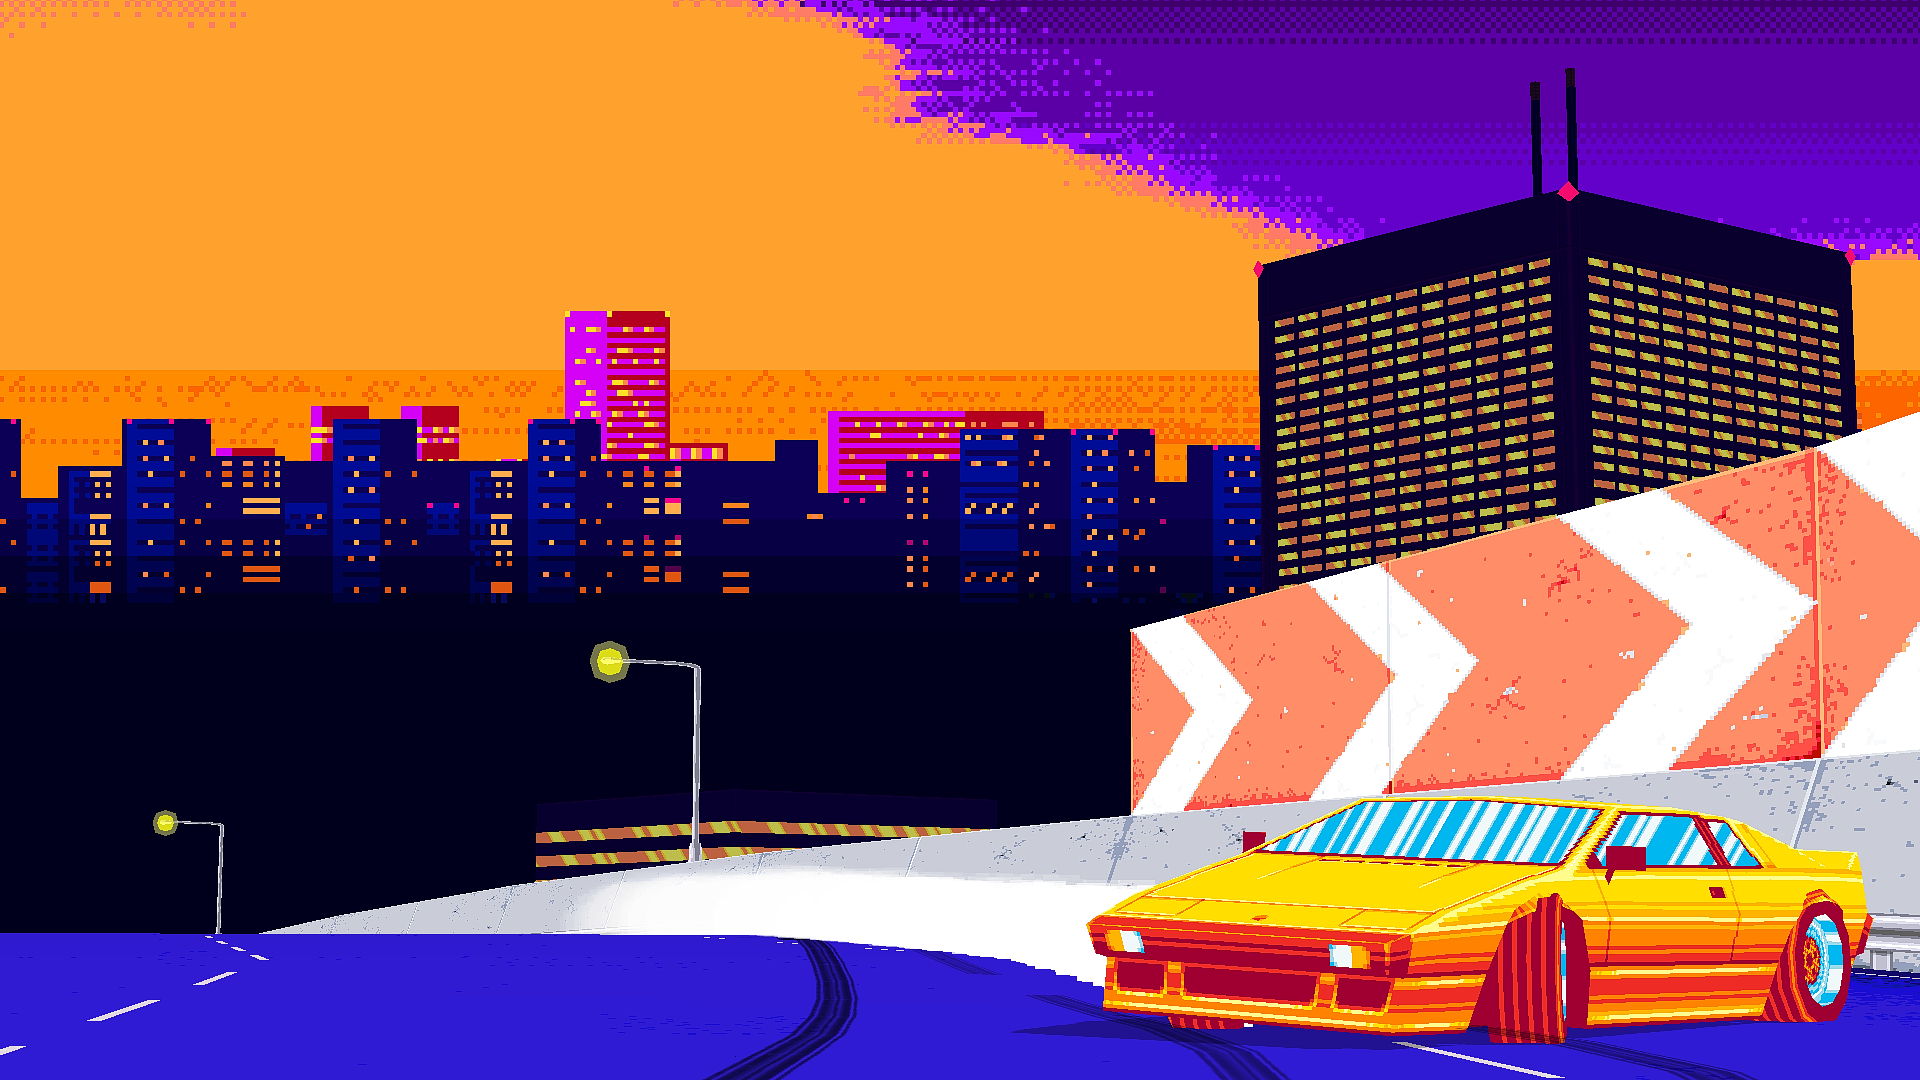 Abstract Highway Pixel Art 1920x1080 R Wallpapers Sunset City Pixel Art Wallpaper